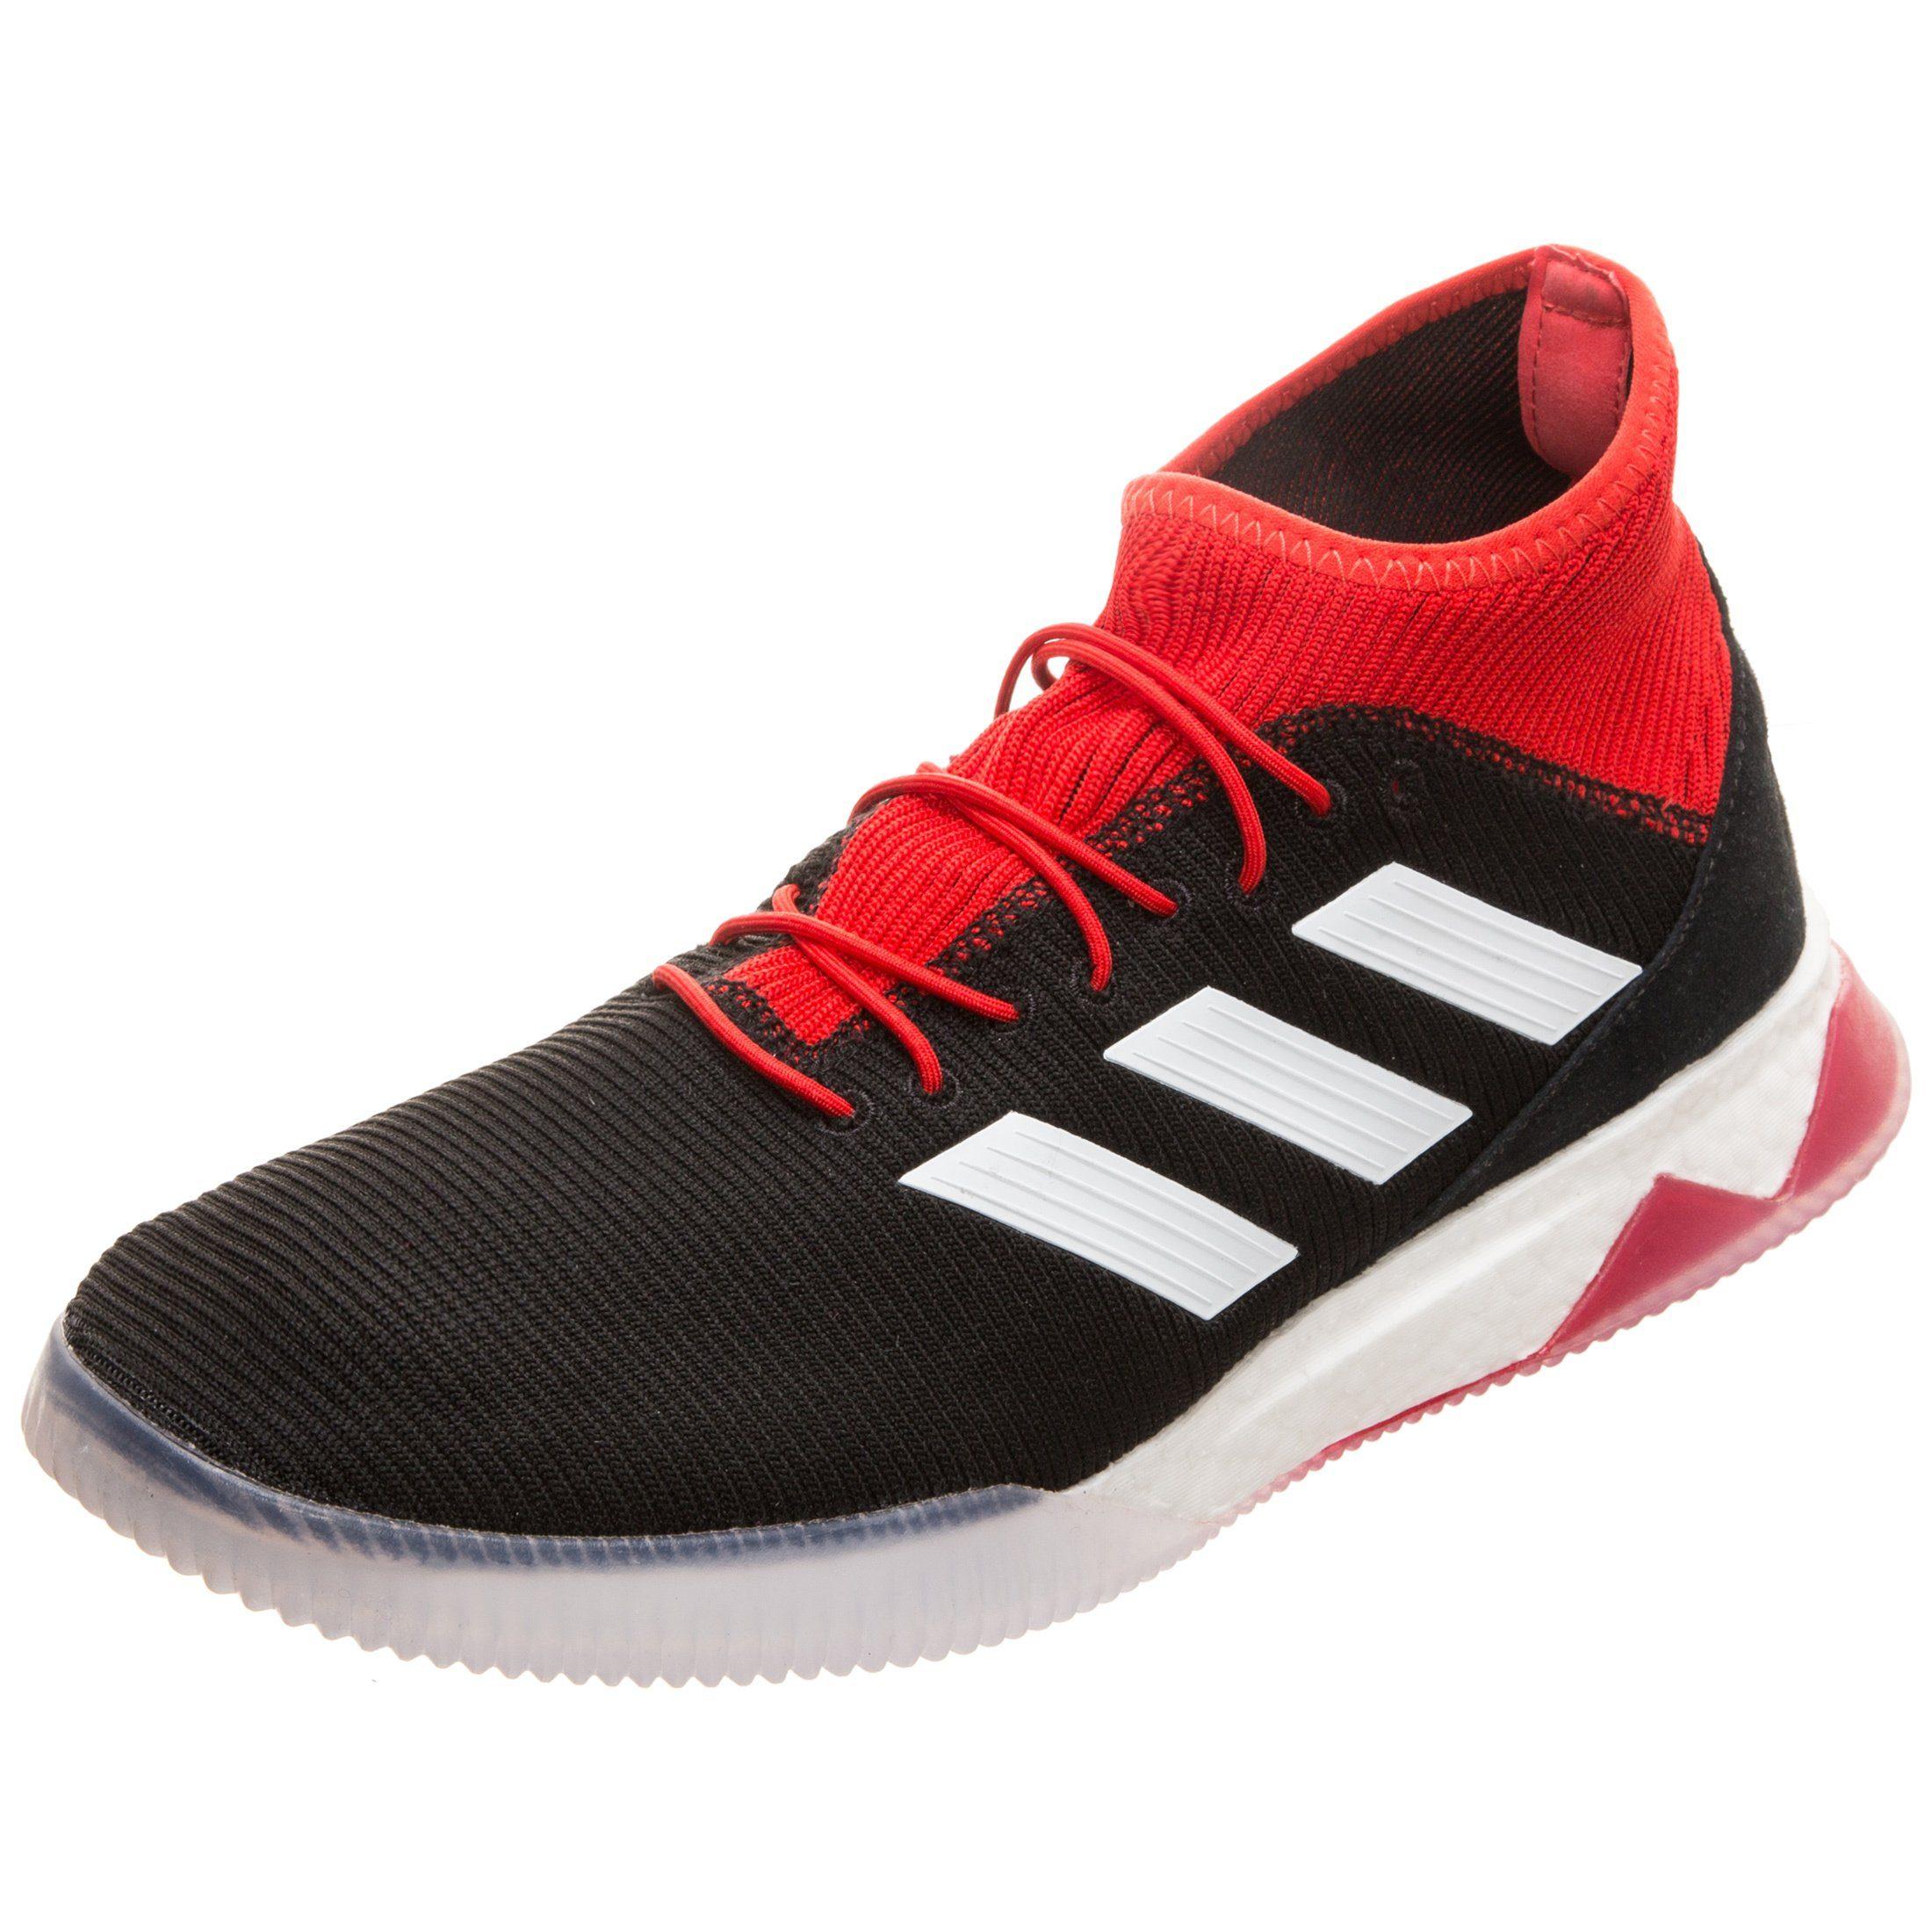 adidas Performance Fußballschuh Predator Tango 181 Tr   Schuhe > Sportschuhe > Fußballschuhe   Schwarz   Adidas Performance